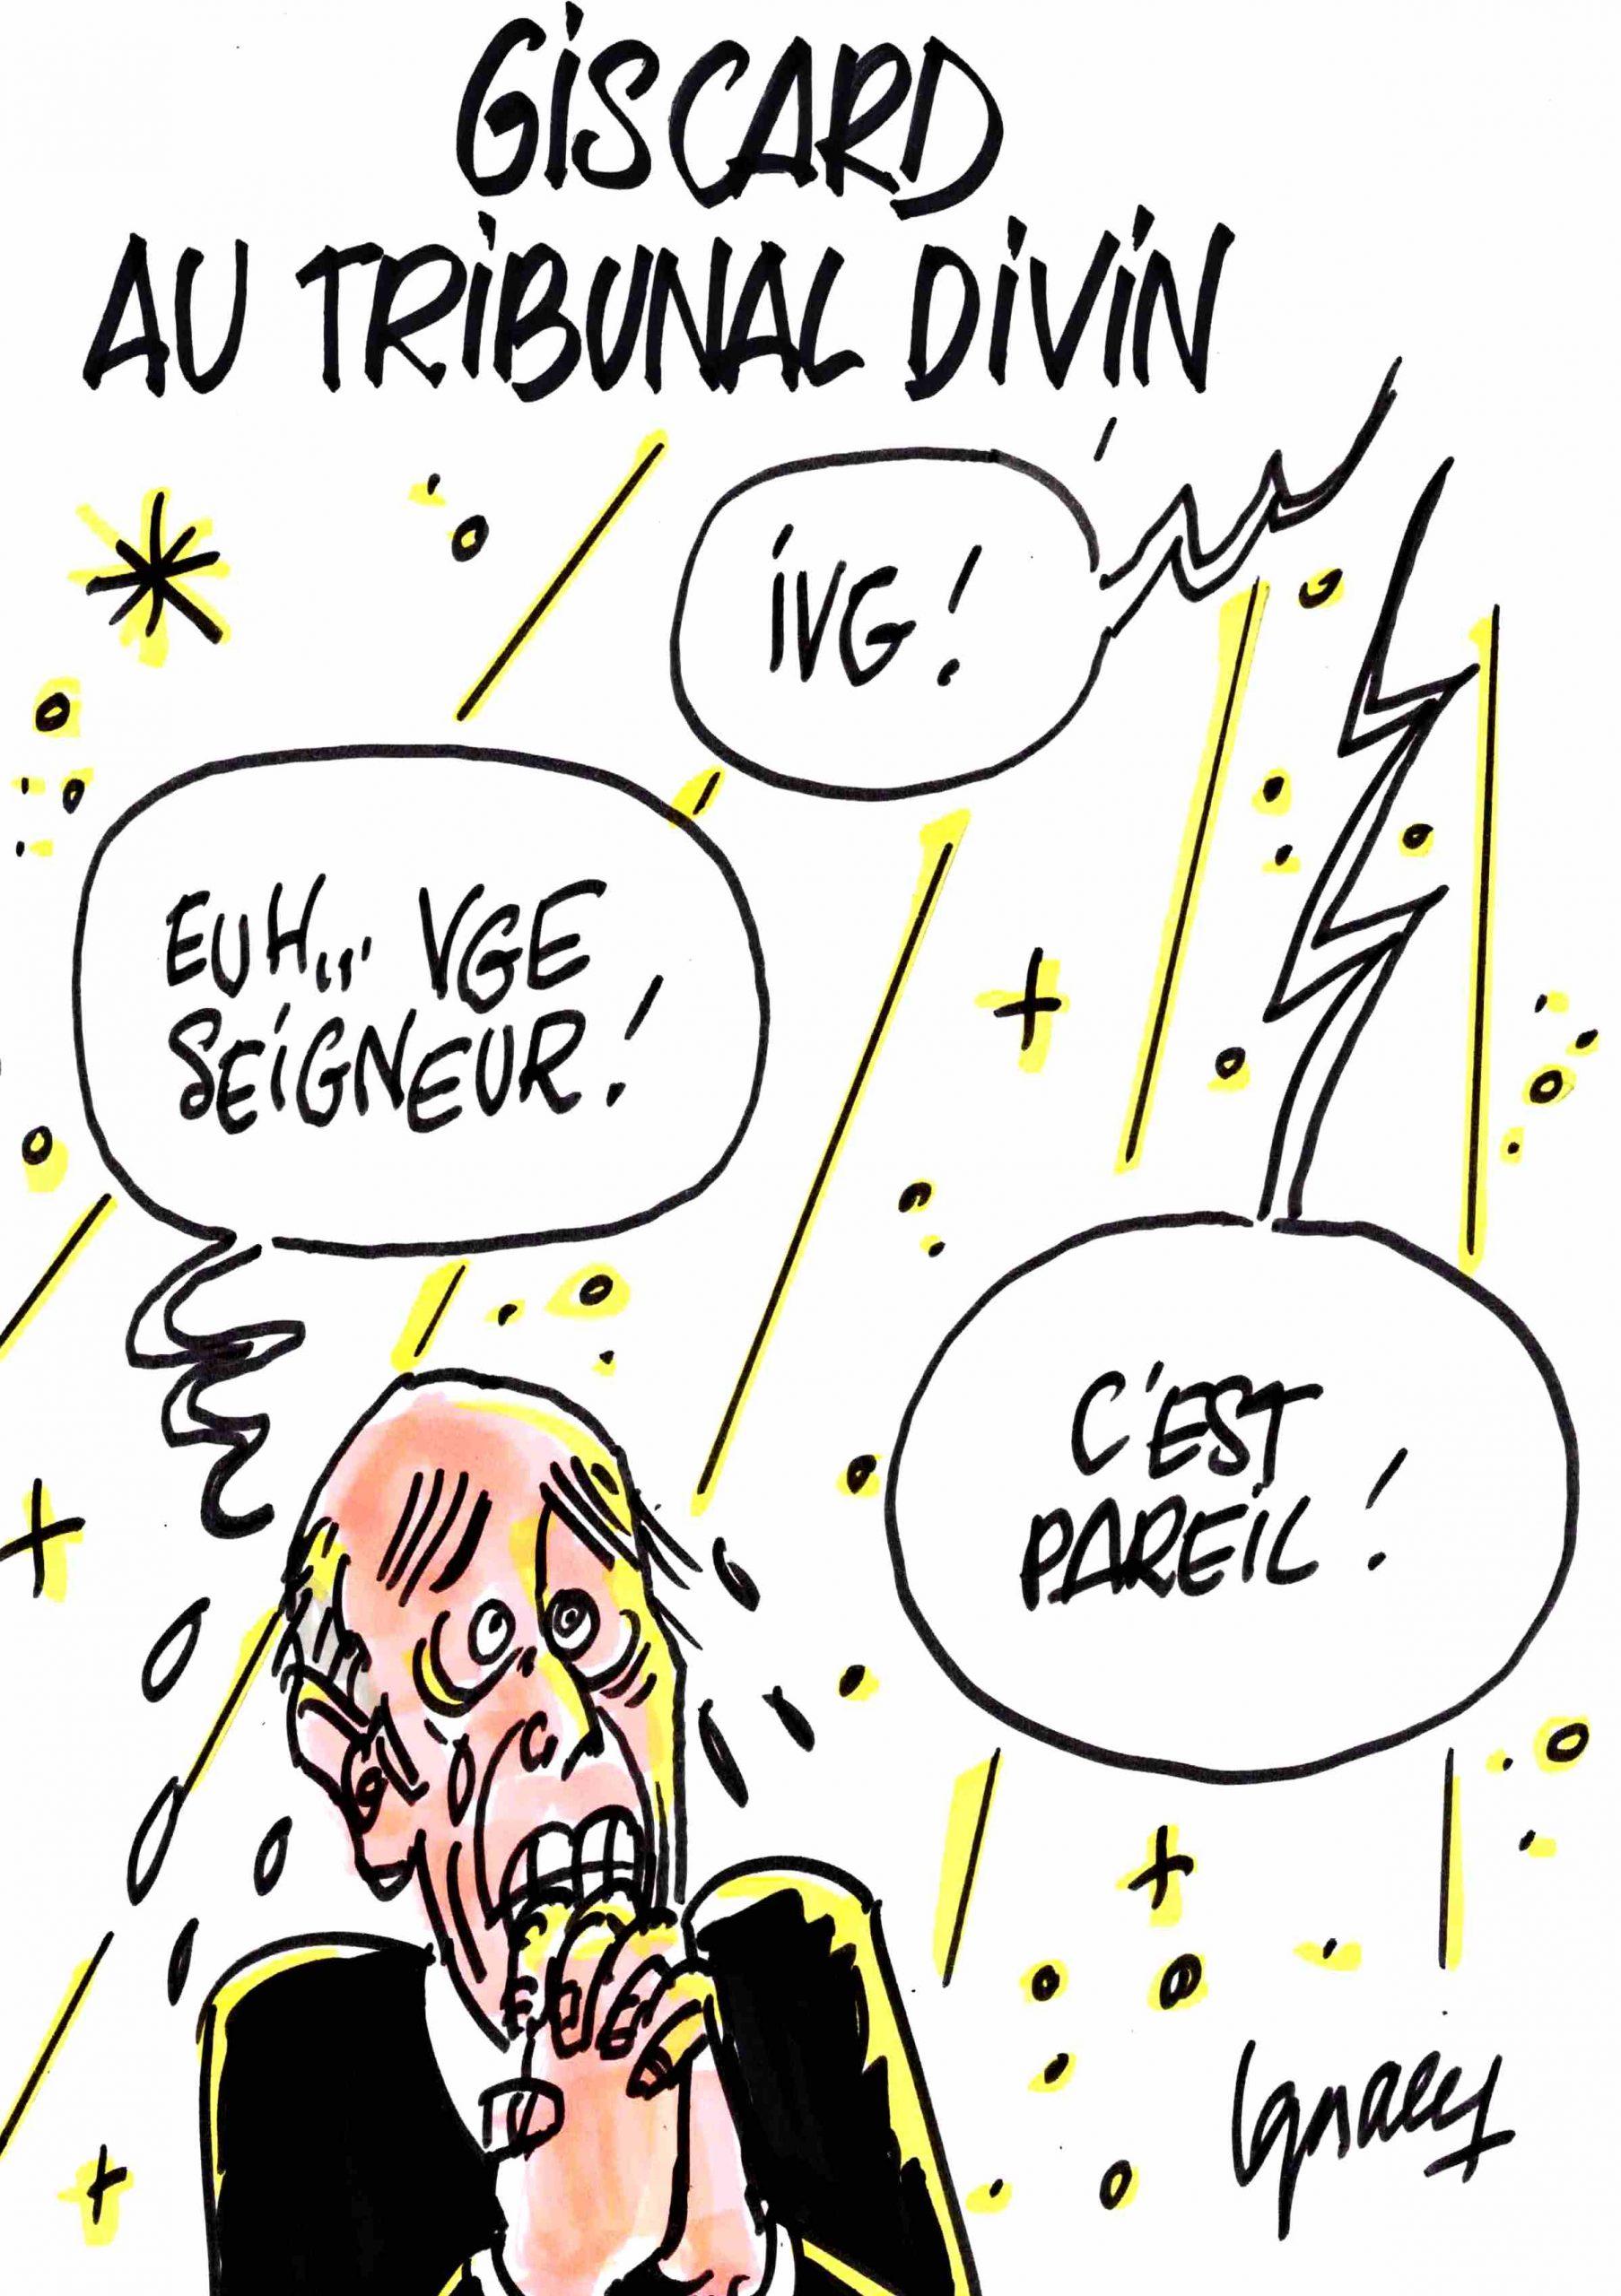 Ignace - Giscard au Tribunal divin